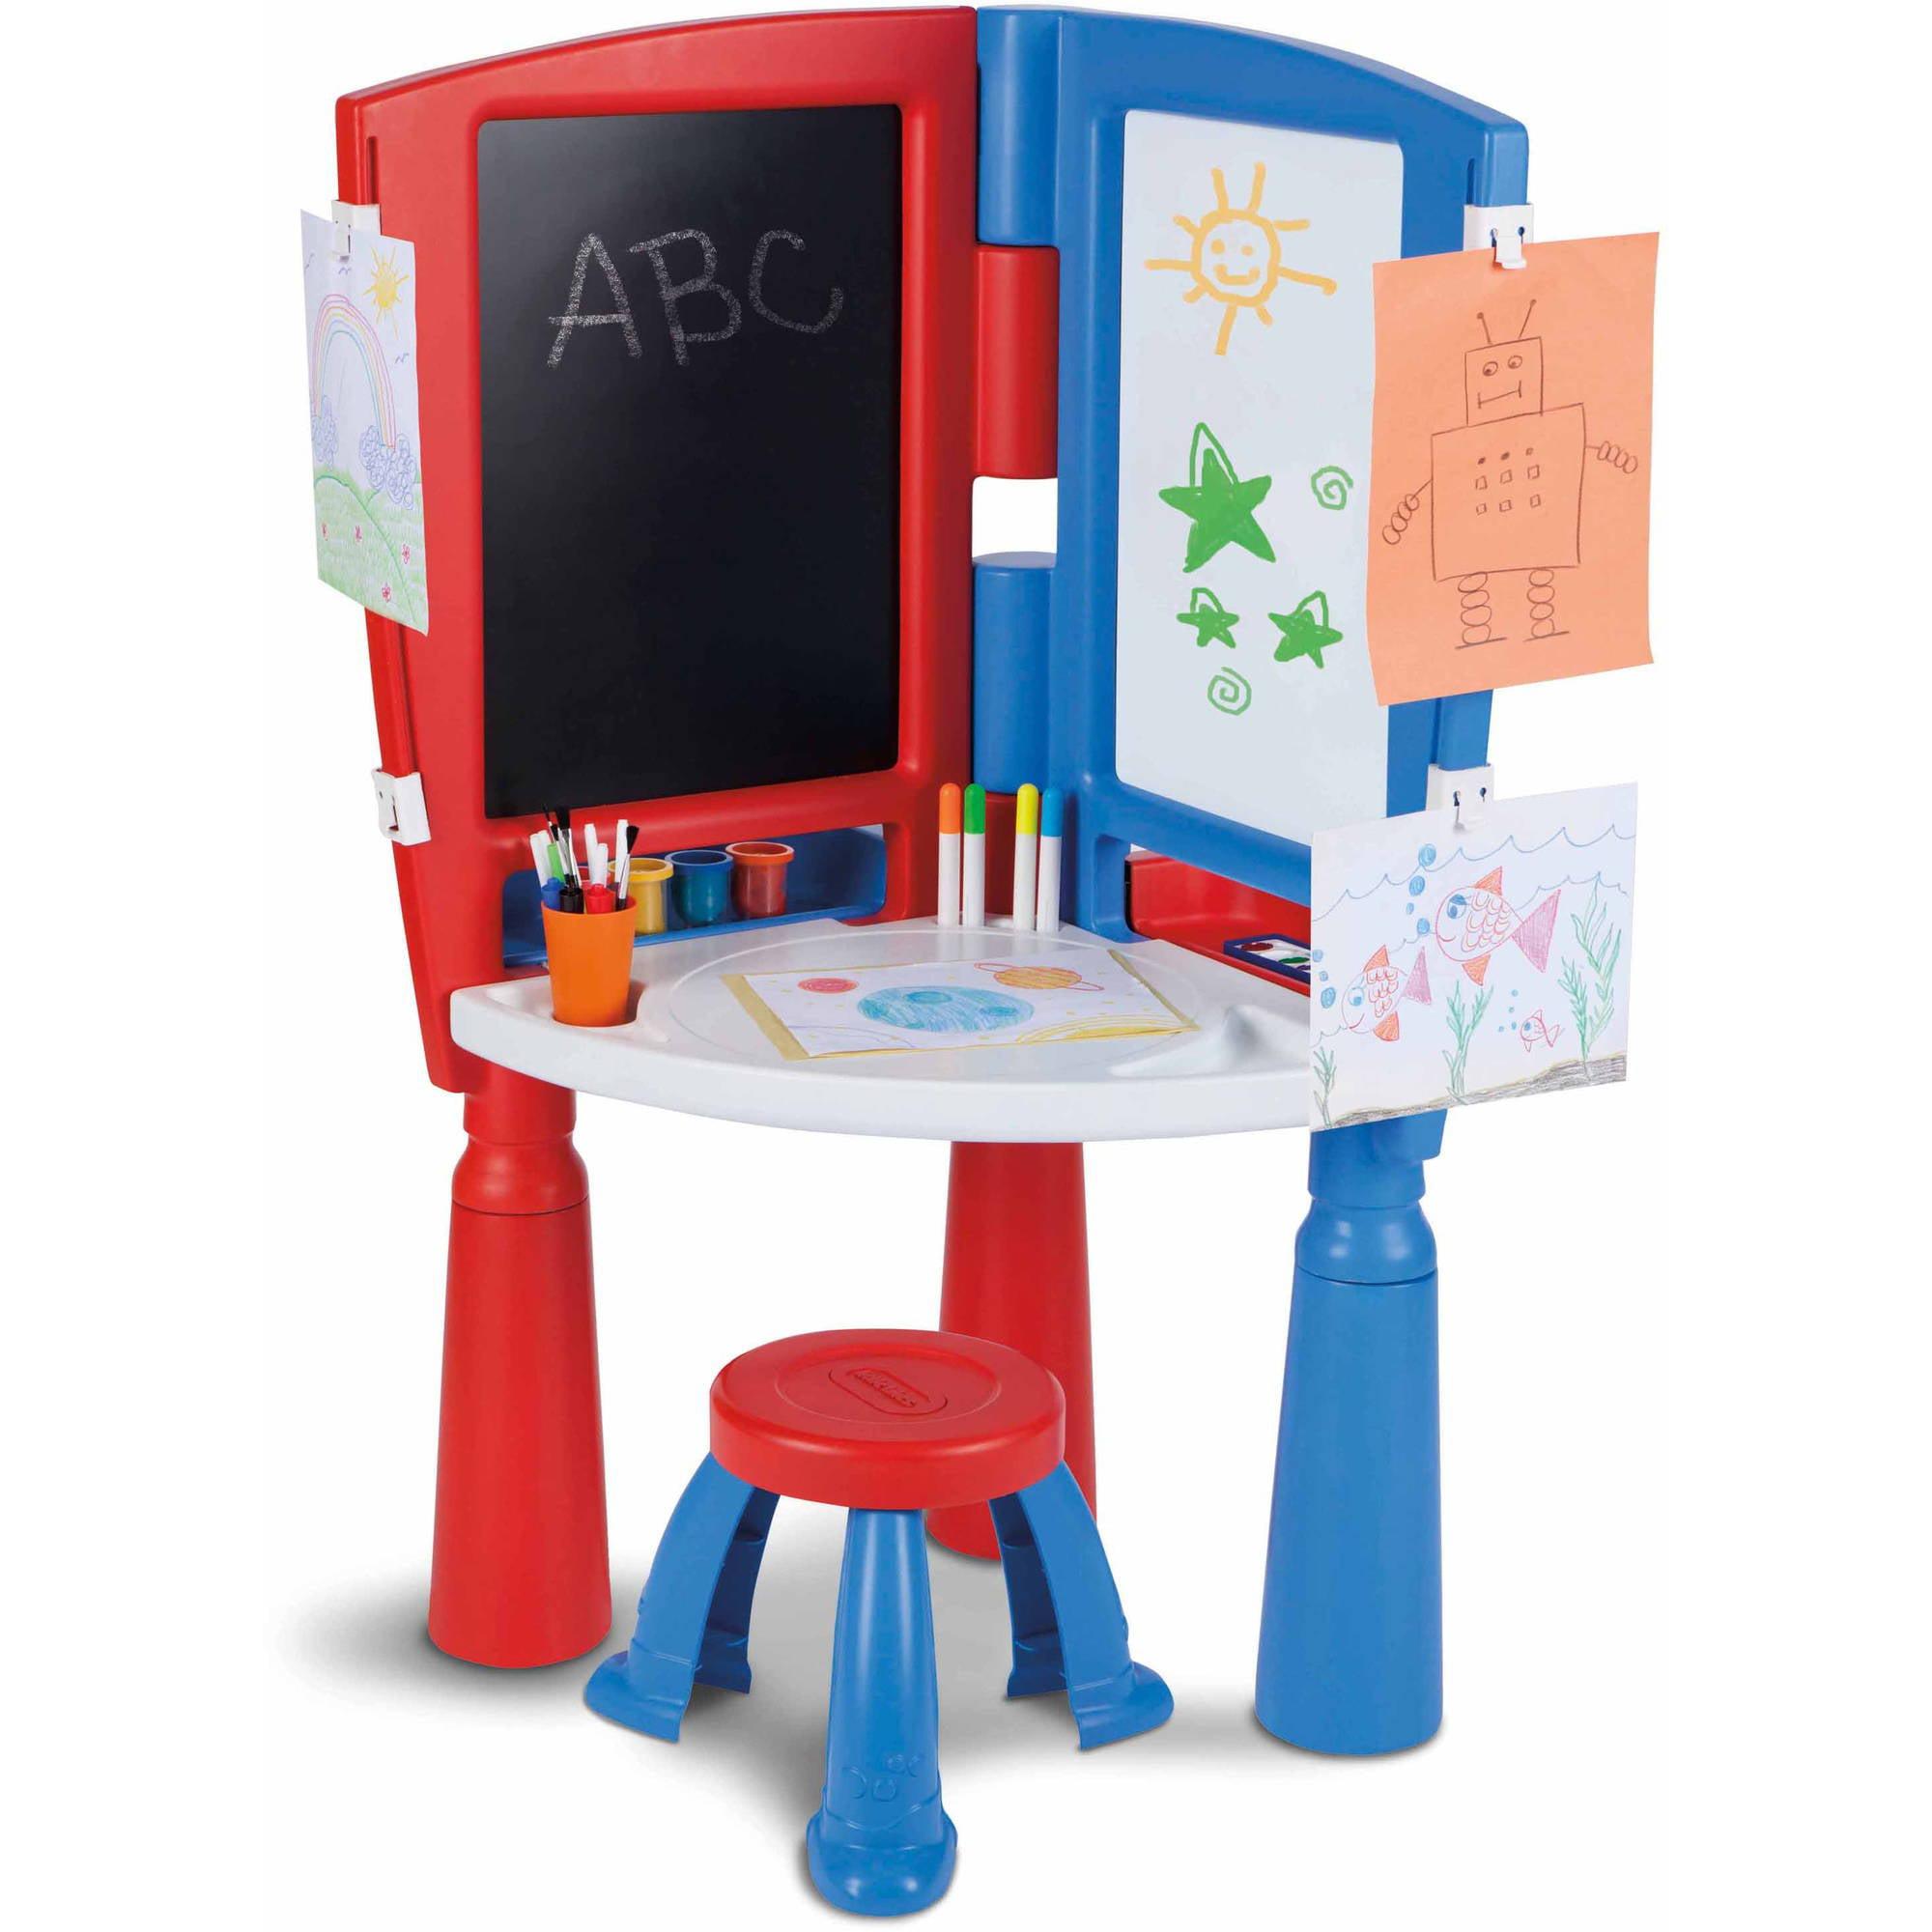 Little Tikes 2-in-1 Art Desk and Easel - Walmart.com